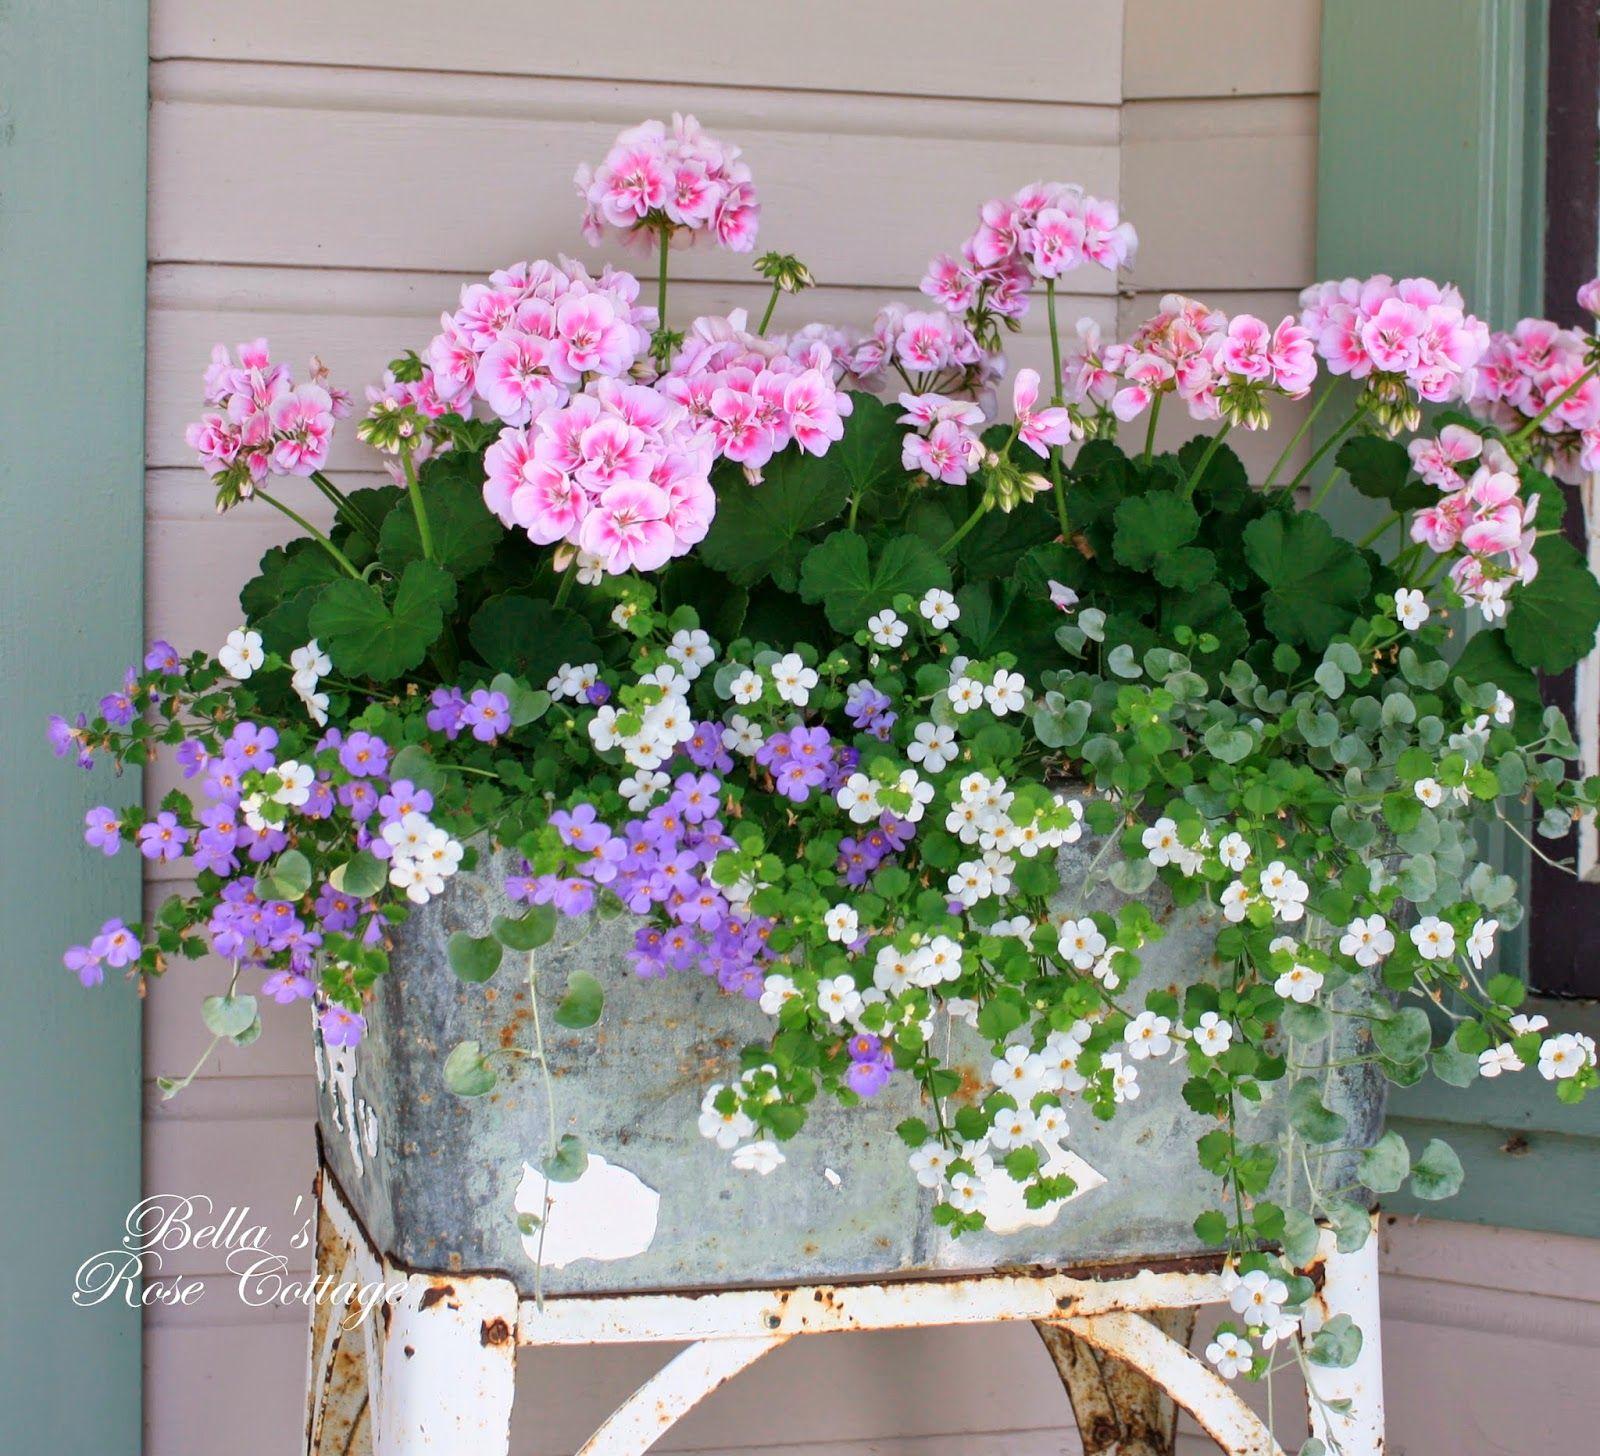 Beautiful Flowers In A Galvanized Washtub Planter Pink Geraniums